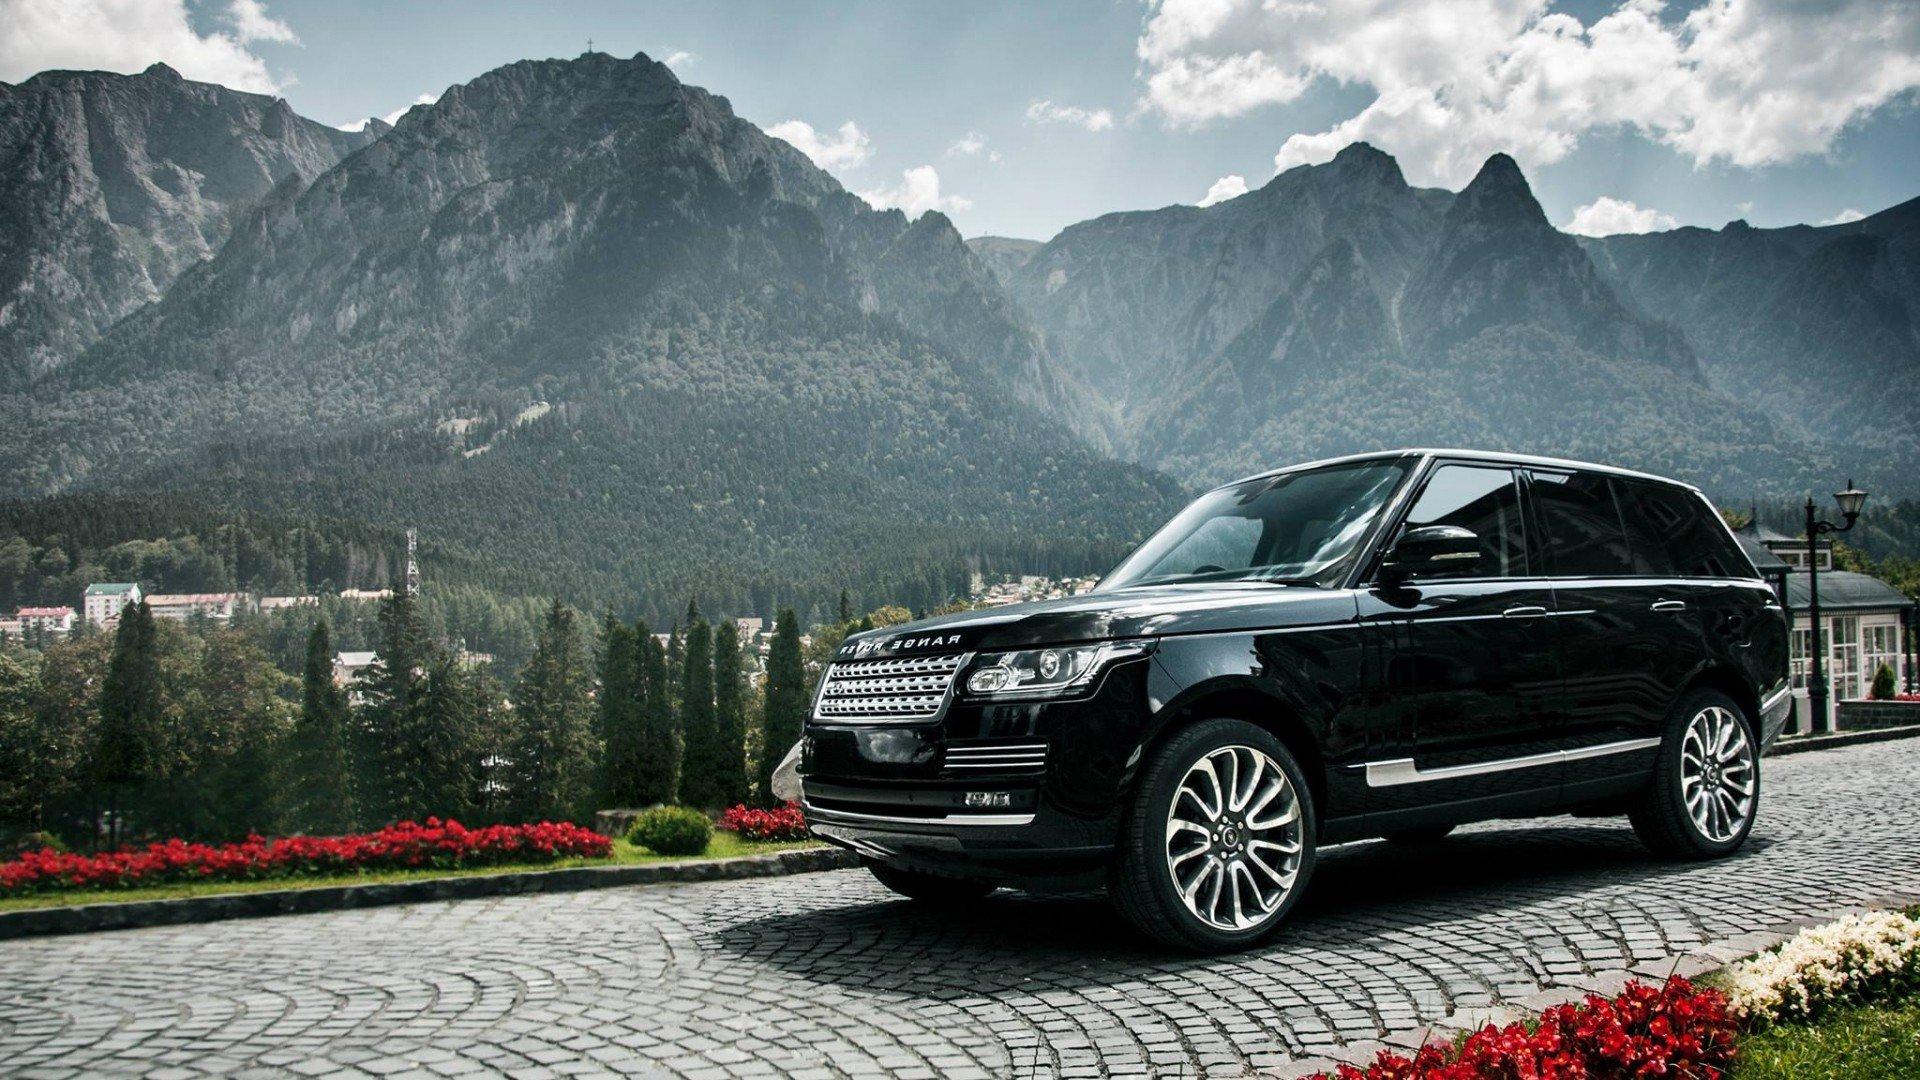 Range Rover Sport Black Wallpaper: Range Rover Black, HD Cars, 4k Wallpapers, Images